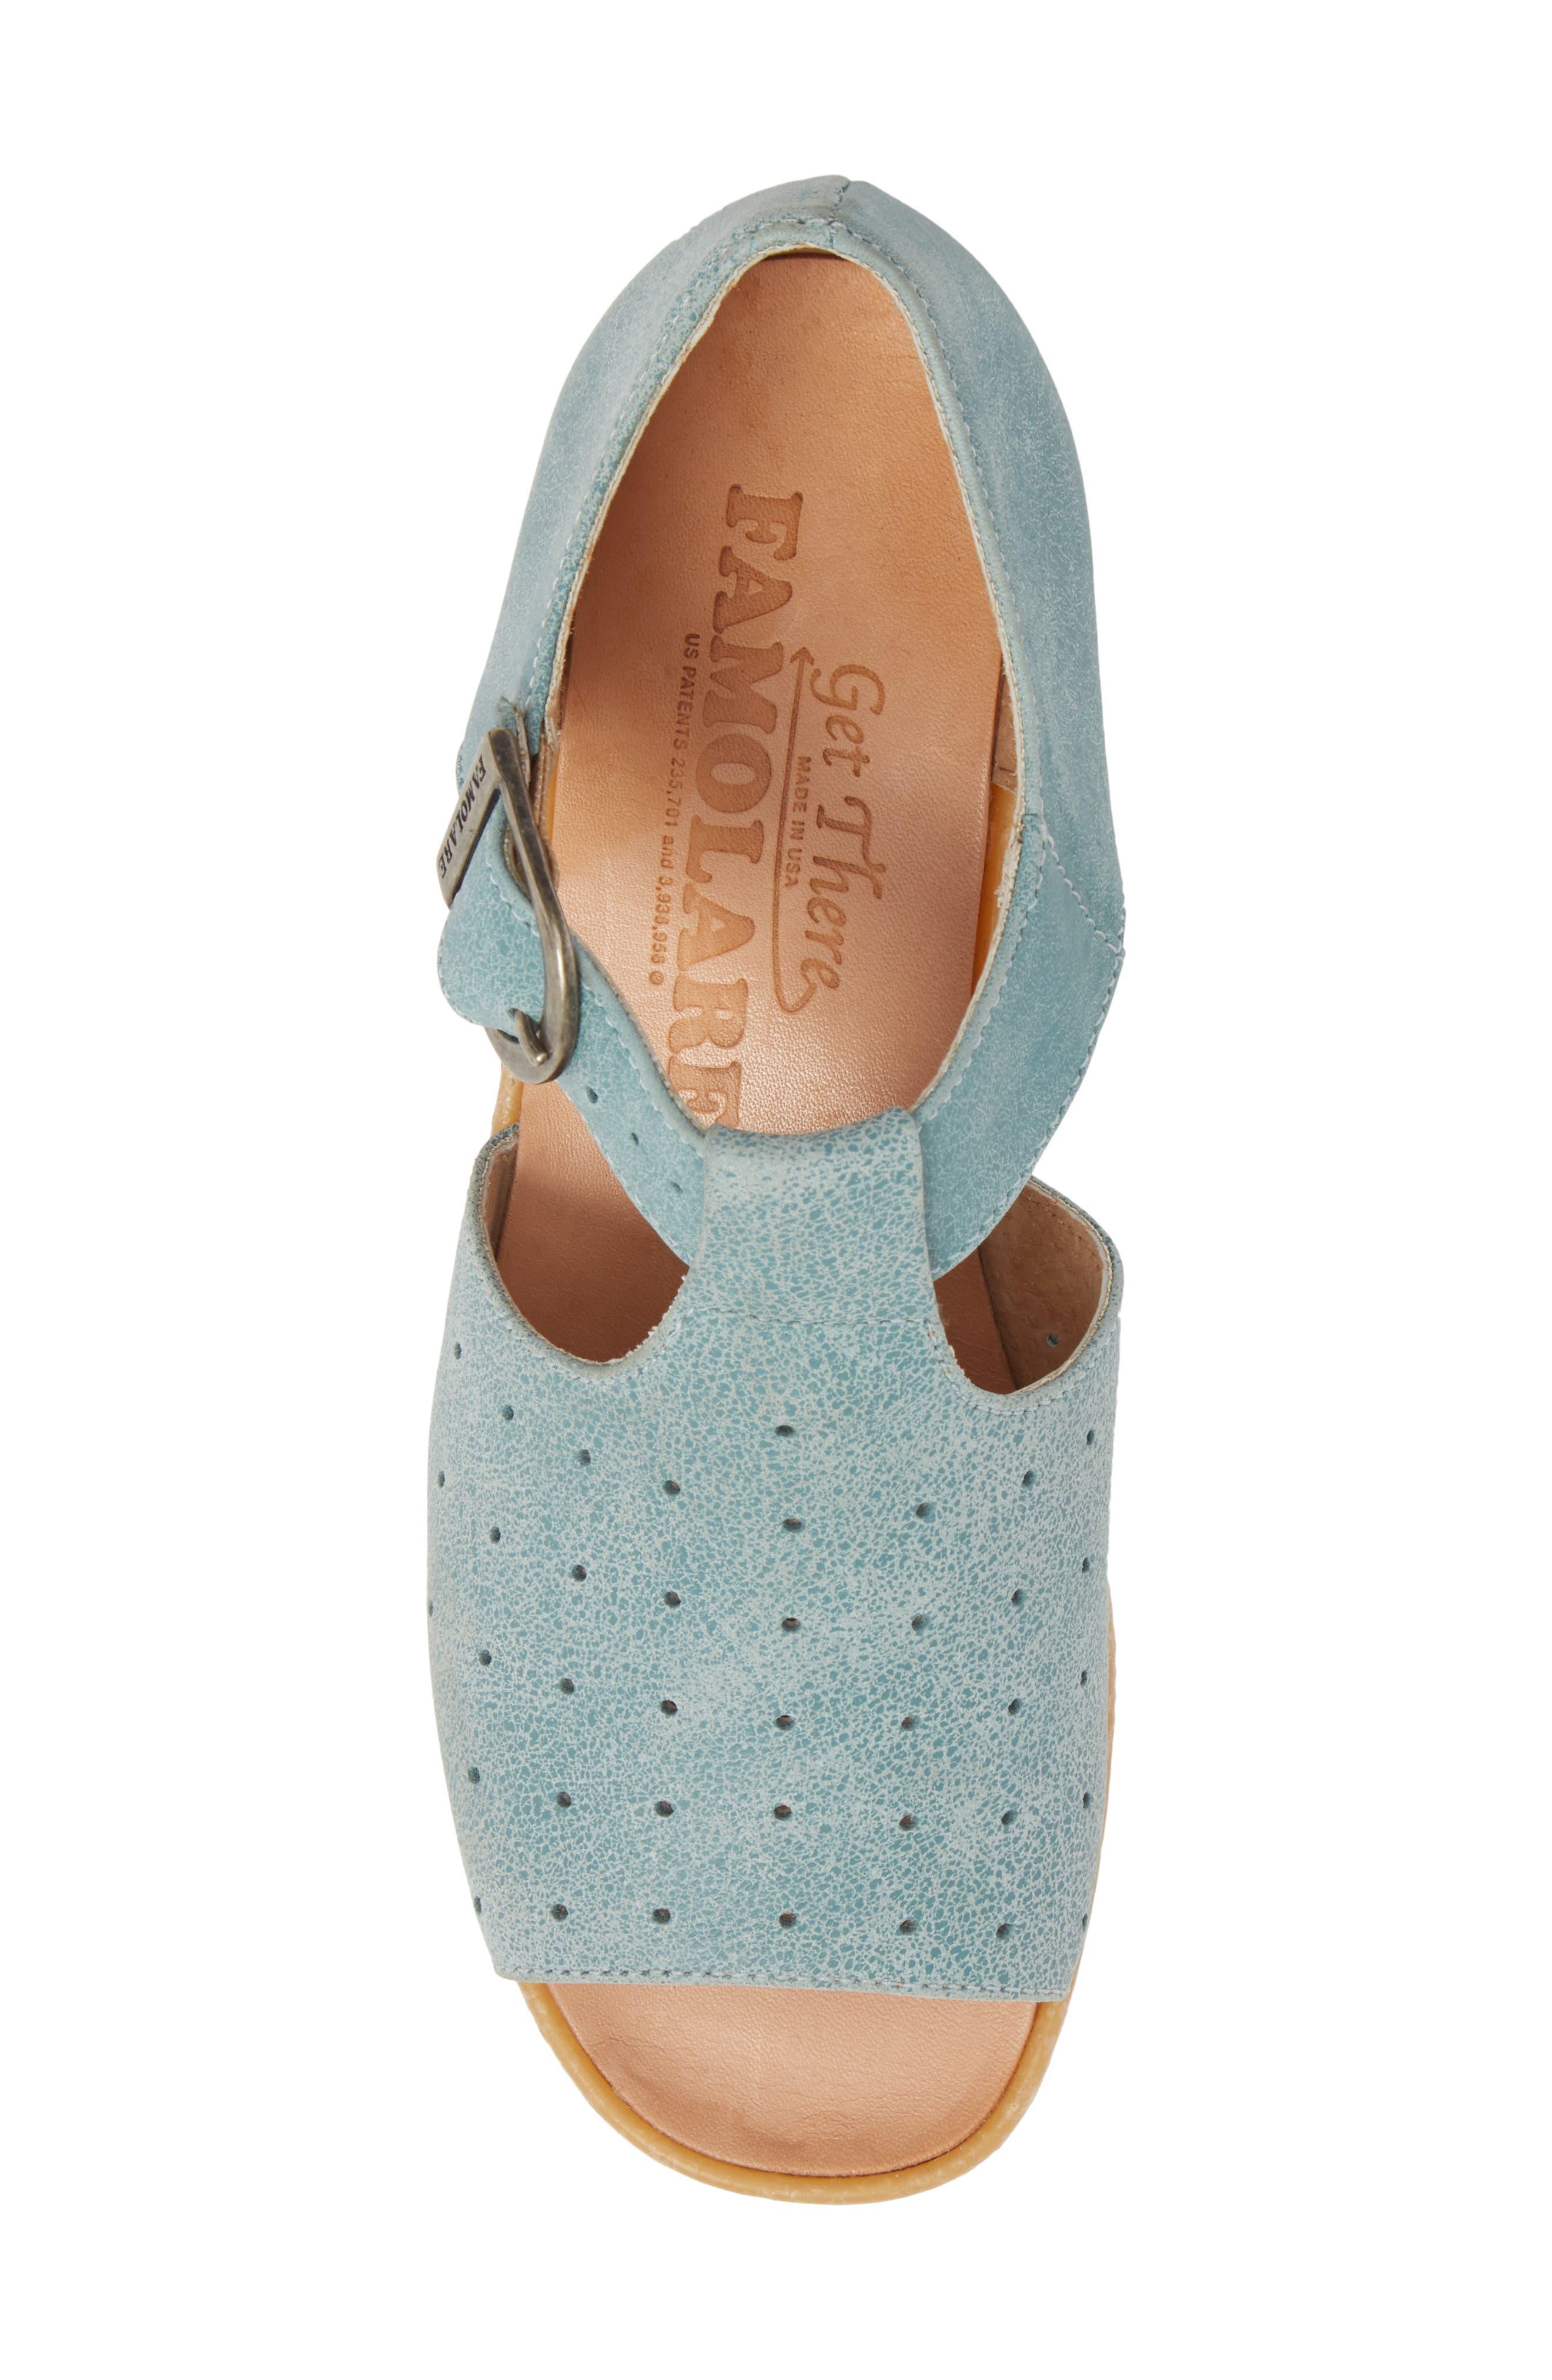 Holey Moley Wedge Sandal,                             Alternate thumbnail 5, color,                             Aqua Mix Leather